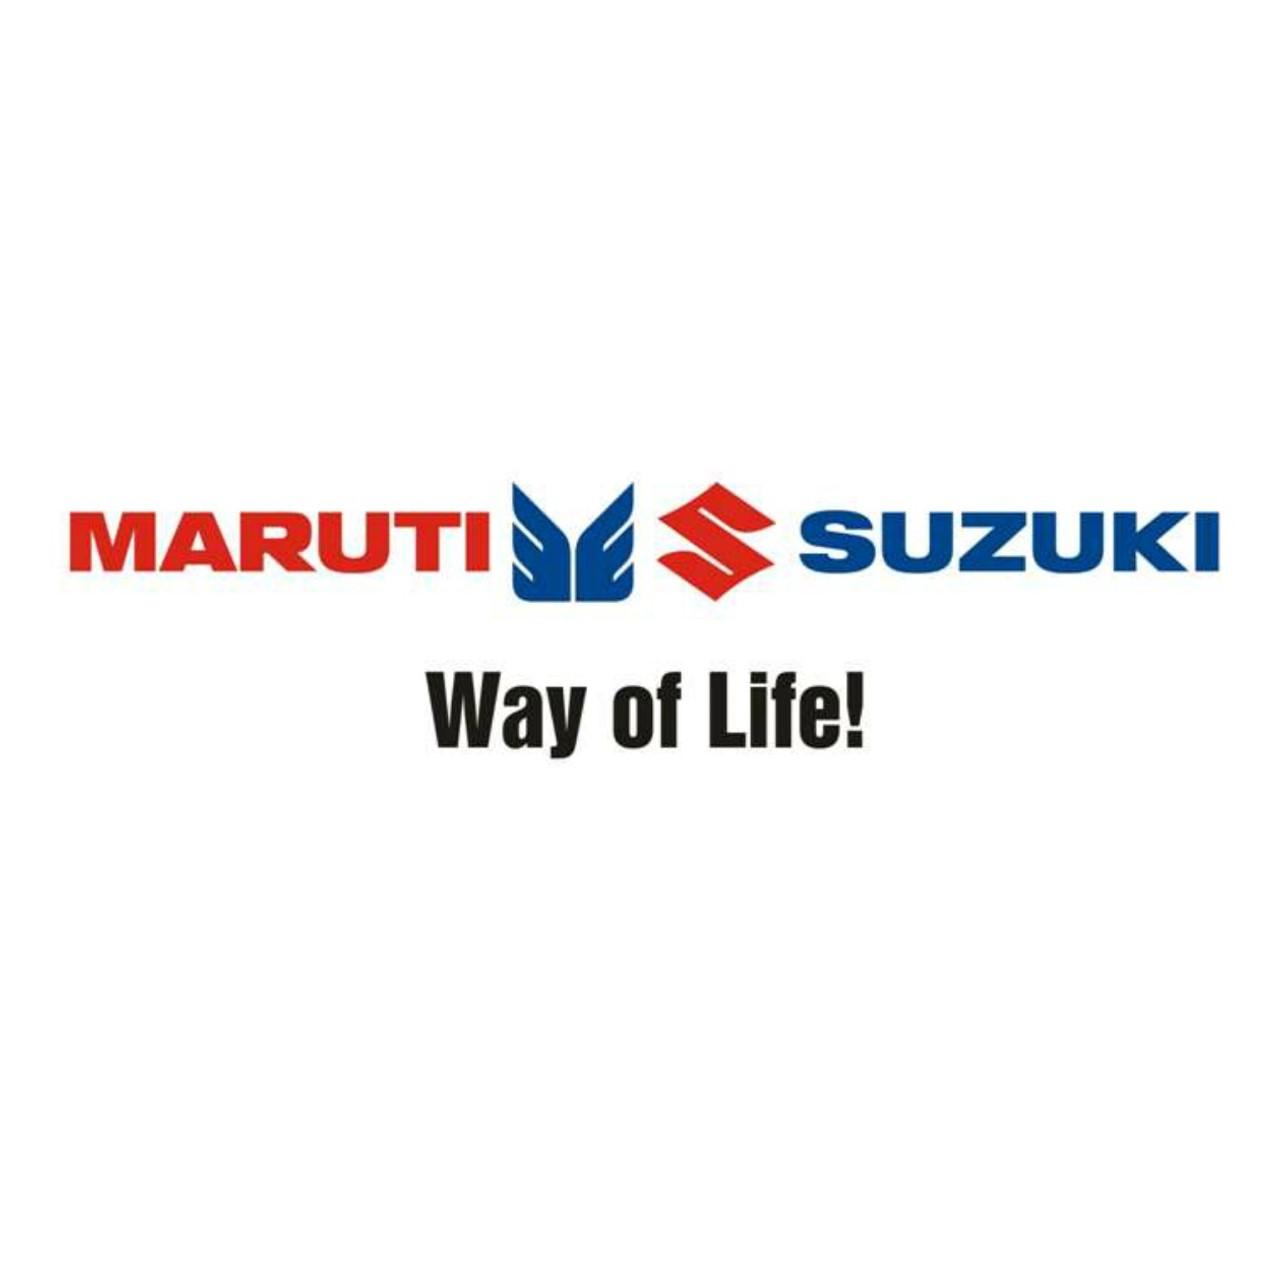 Maruti Suzuki Production